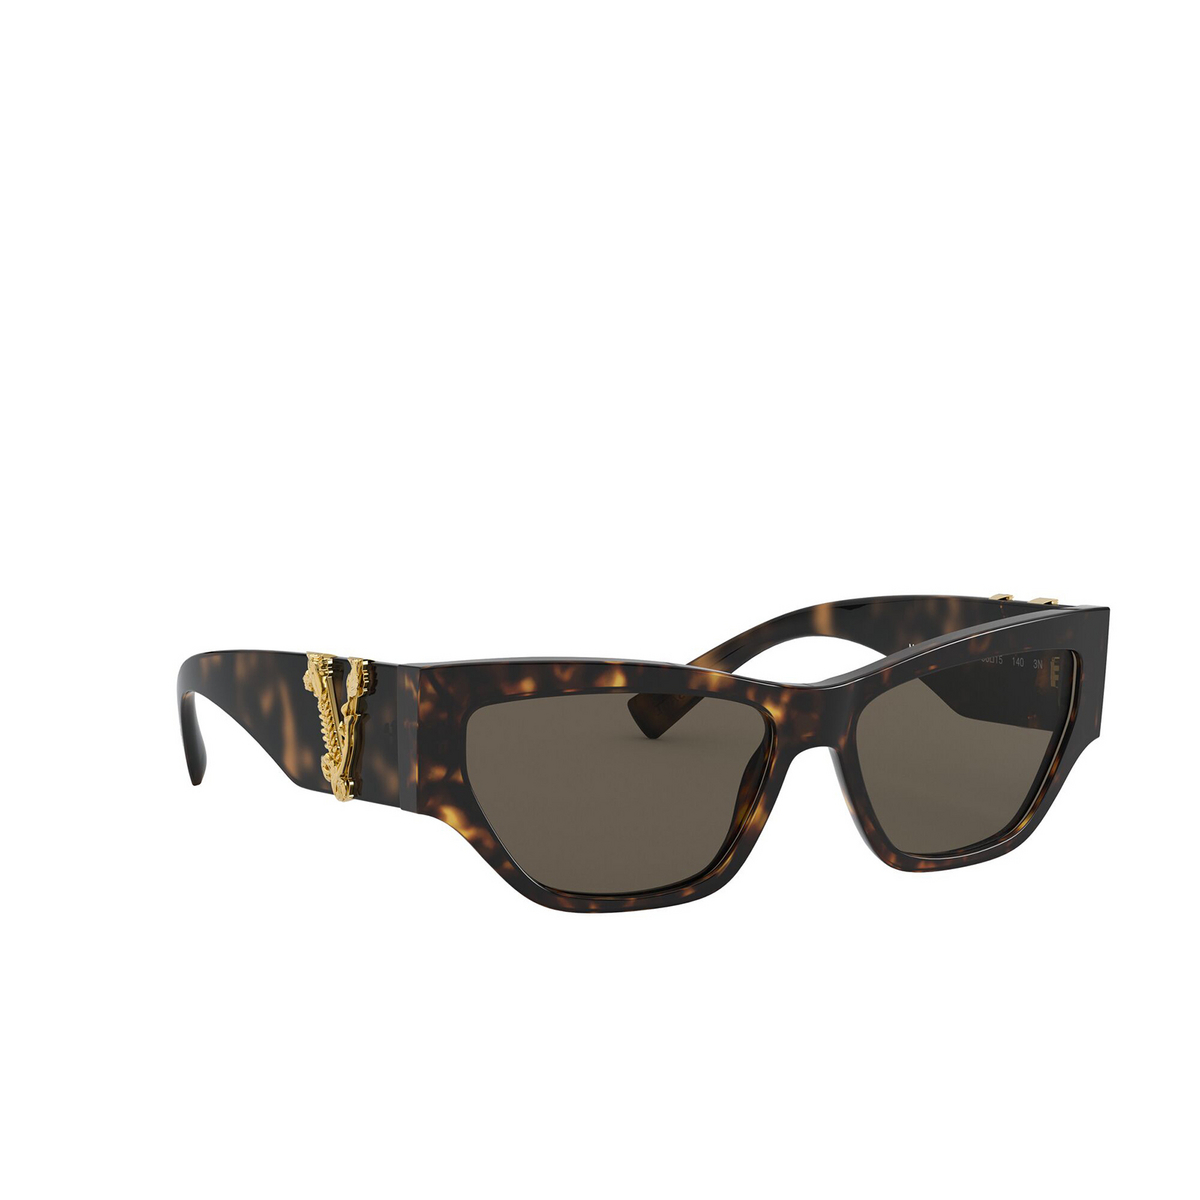 Versace® Cat-eye Sunglasses: VE4383 color Havana 944/3 - three-quarters view.